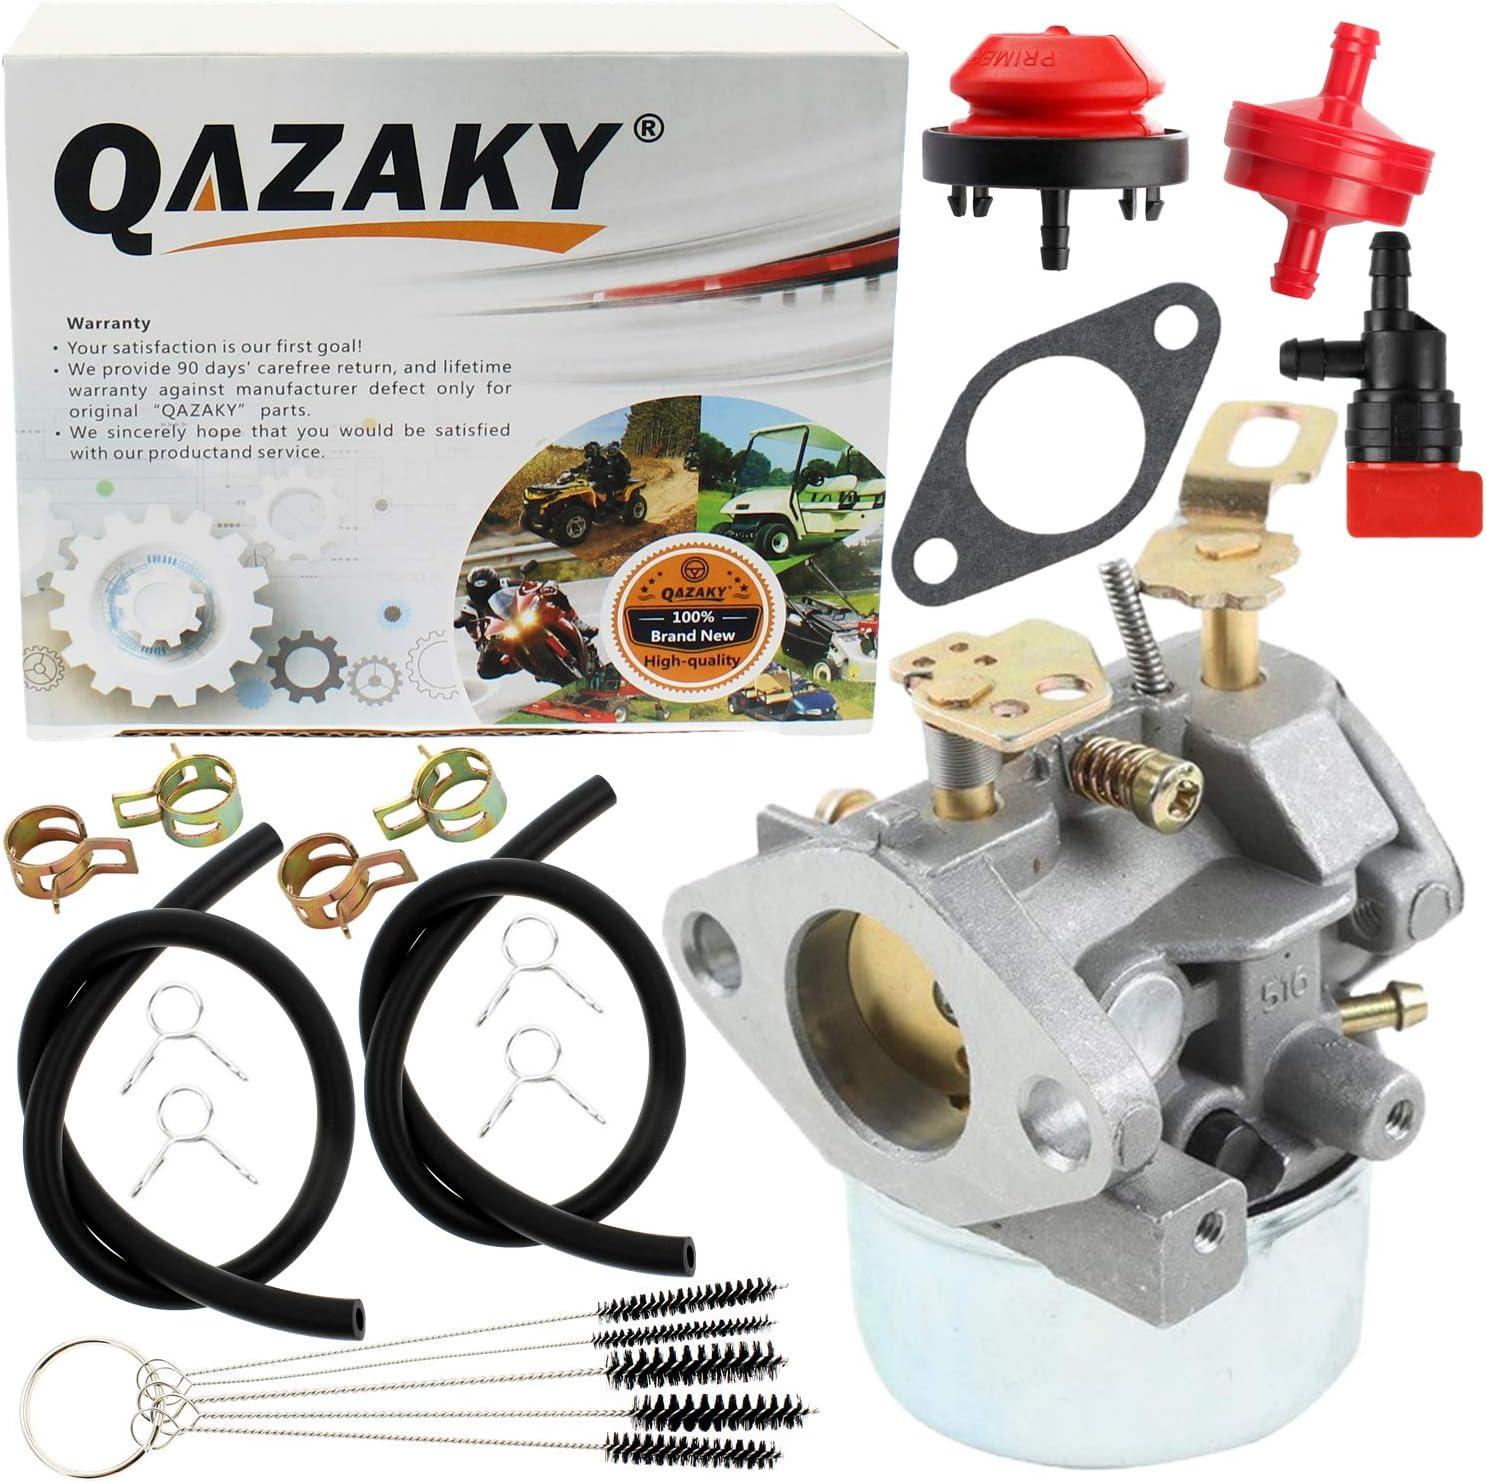 QAZAKY Carburetor Replacement for Tecumseh 640349 640052 640054 640058 640058A HMSK80 HMSK85 HMSK90 HMSK100 HSMK110 LH318A LH358SA 8HP 9HP 10HP Snowblower Generator Chipper Shredder Carb 50659 520926